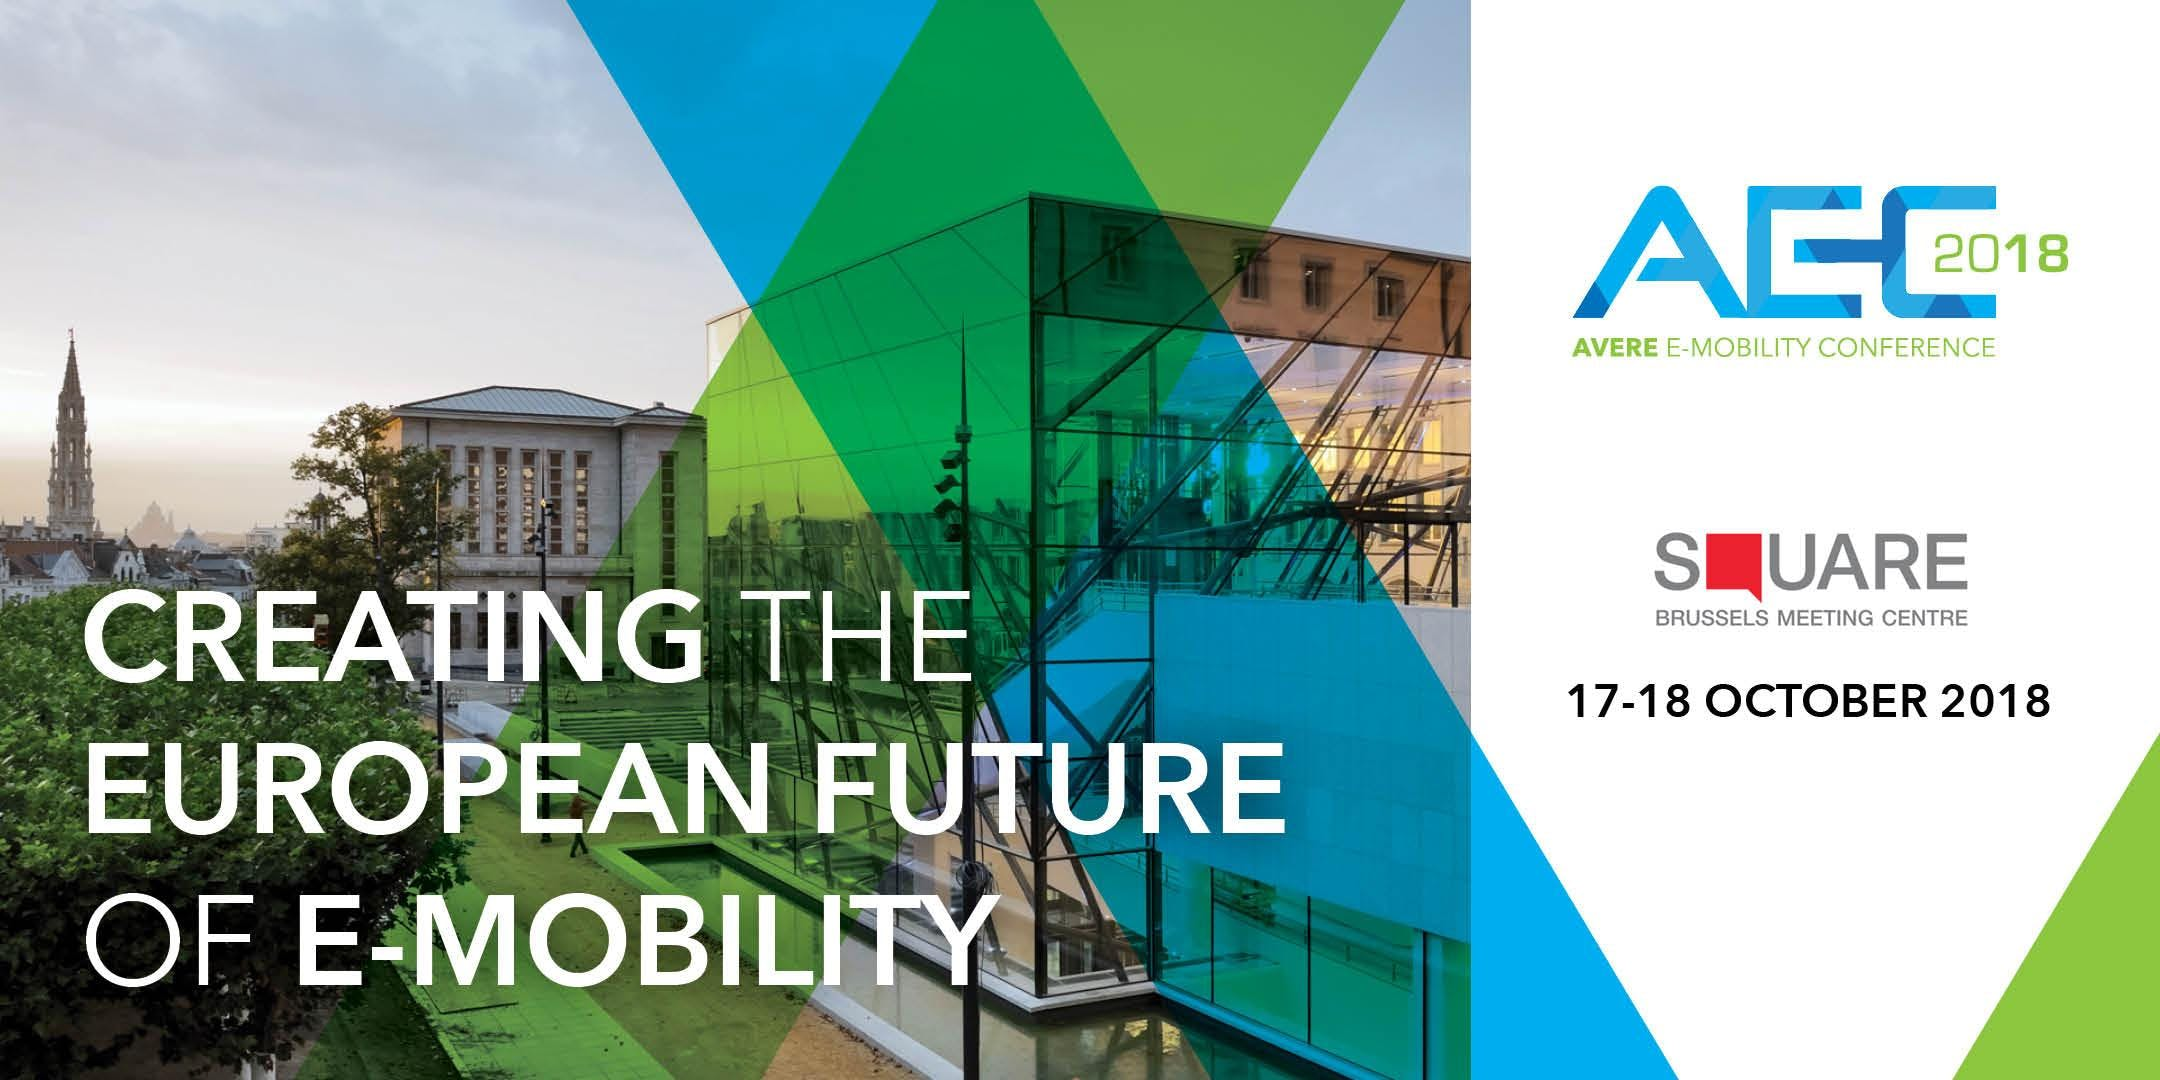 AEC 2018 - AVERE E-Mobility Conference